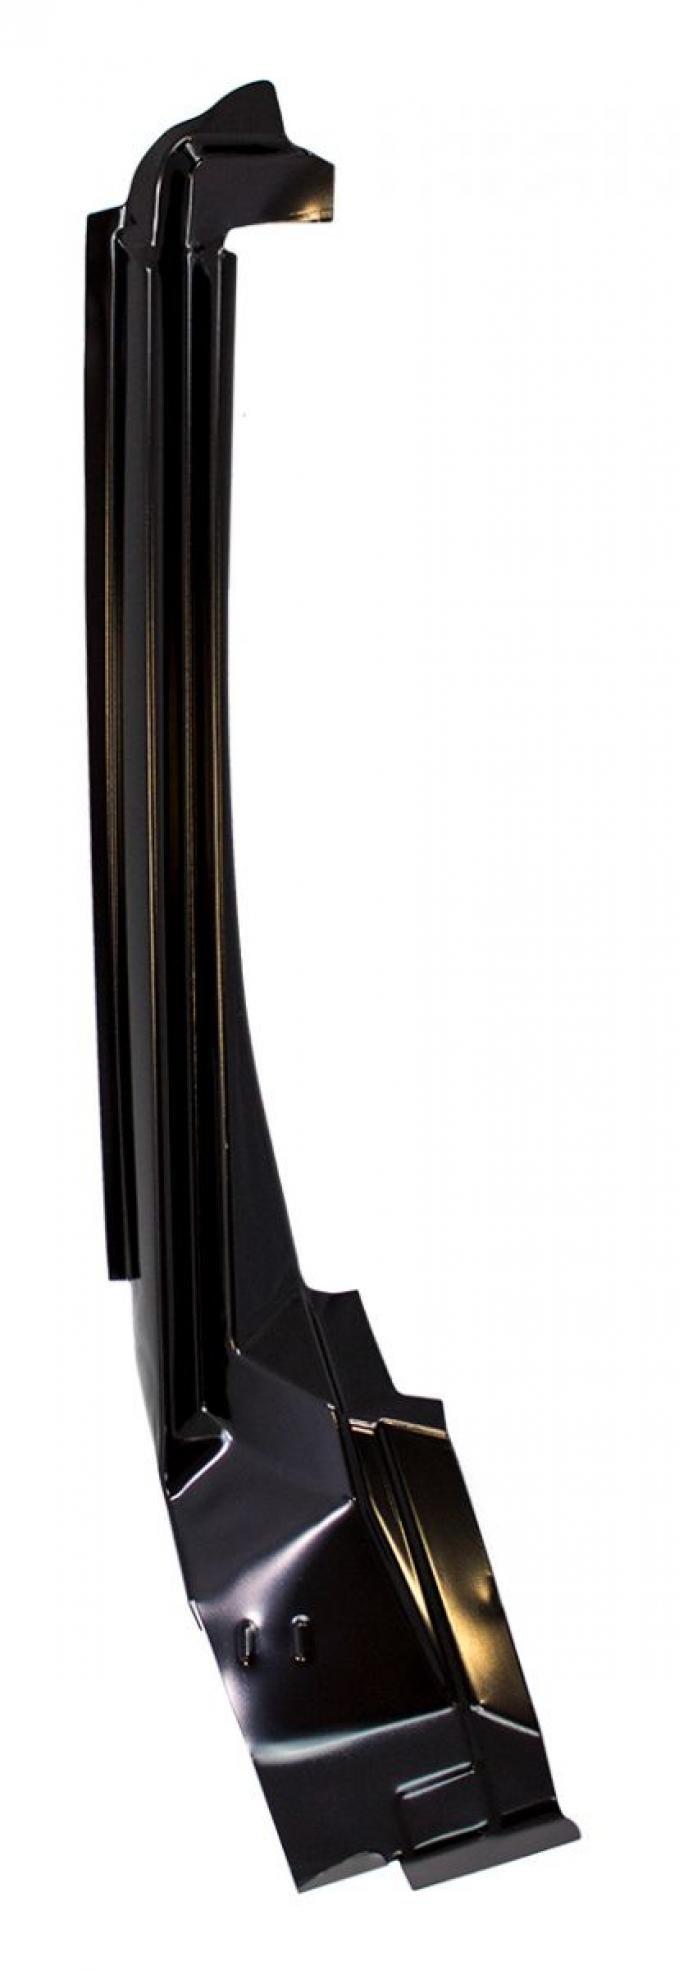 AMD A-Pillar Outer Cover, RH, 68-72 Skylark Chevelle Cutlass GTO 375-3468-1R